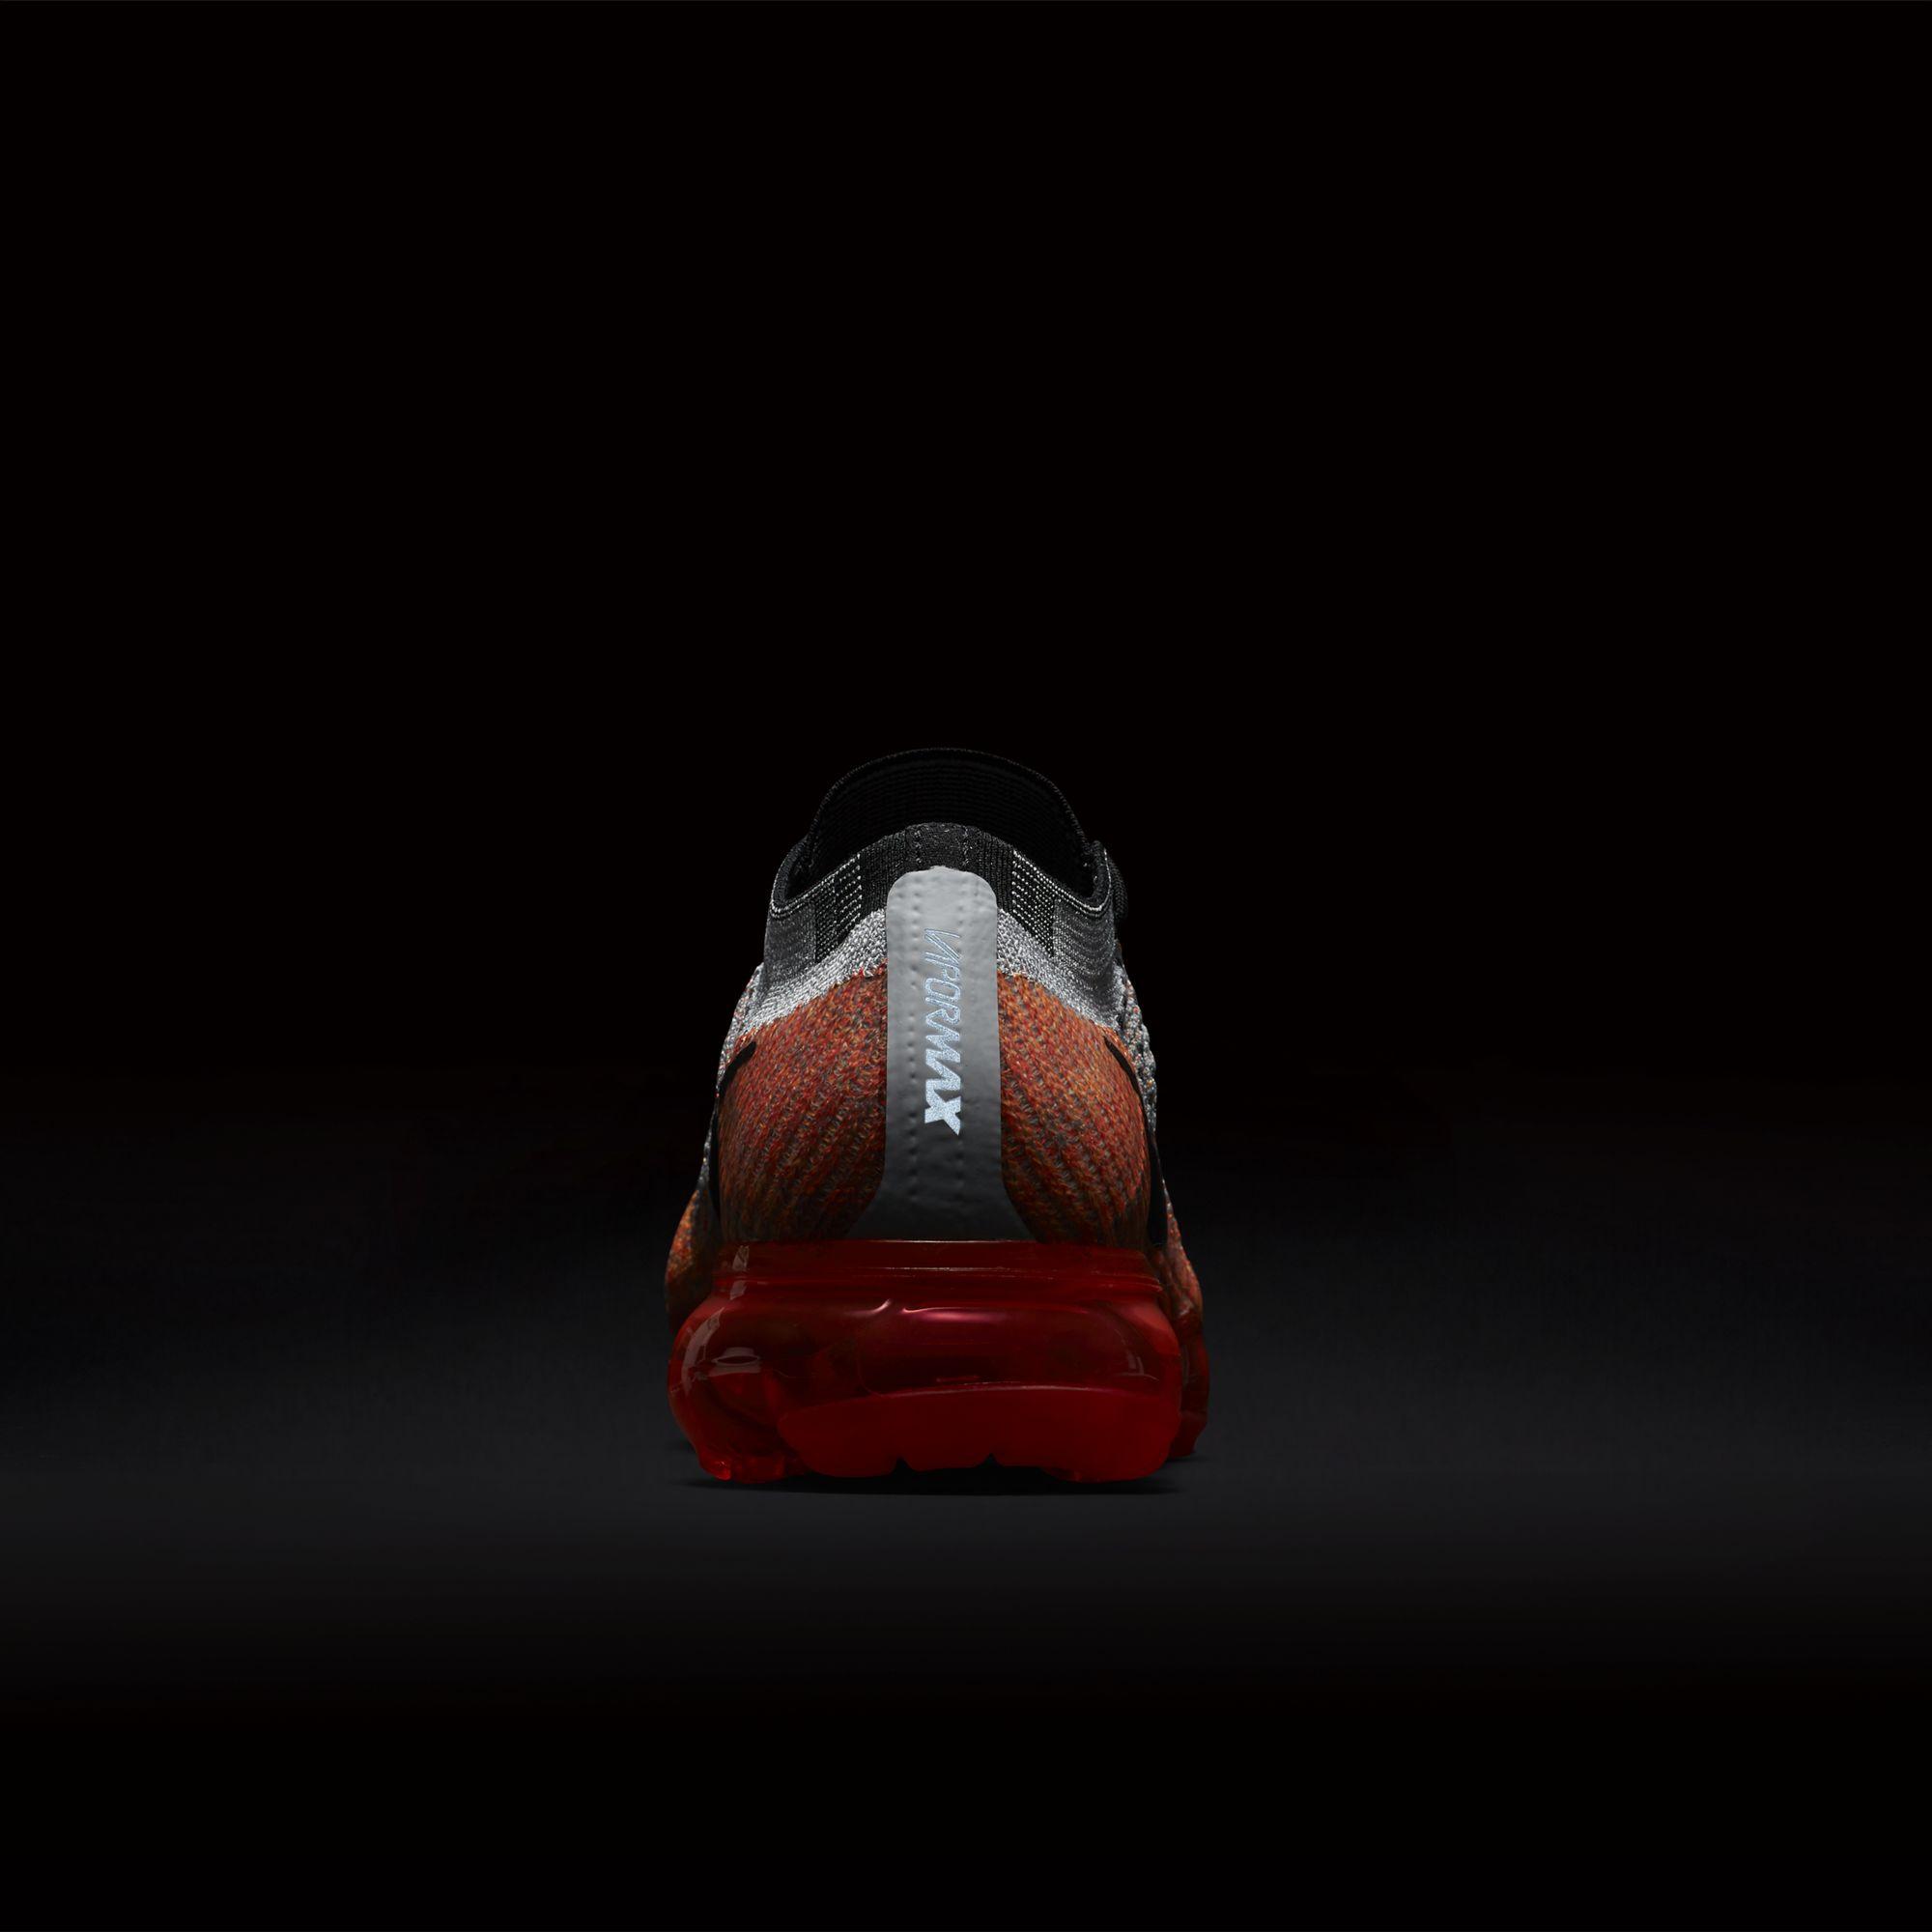 Nike,Air VaporMax  醒目橘色!全新配色 Air VaporMax 官图曝光